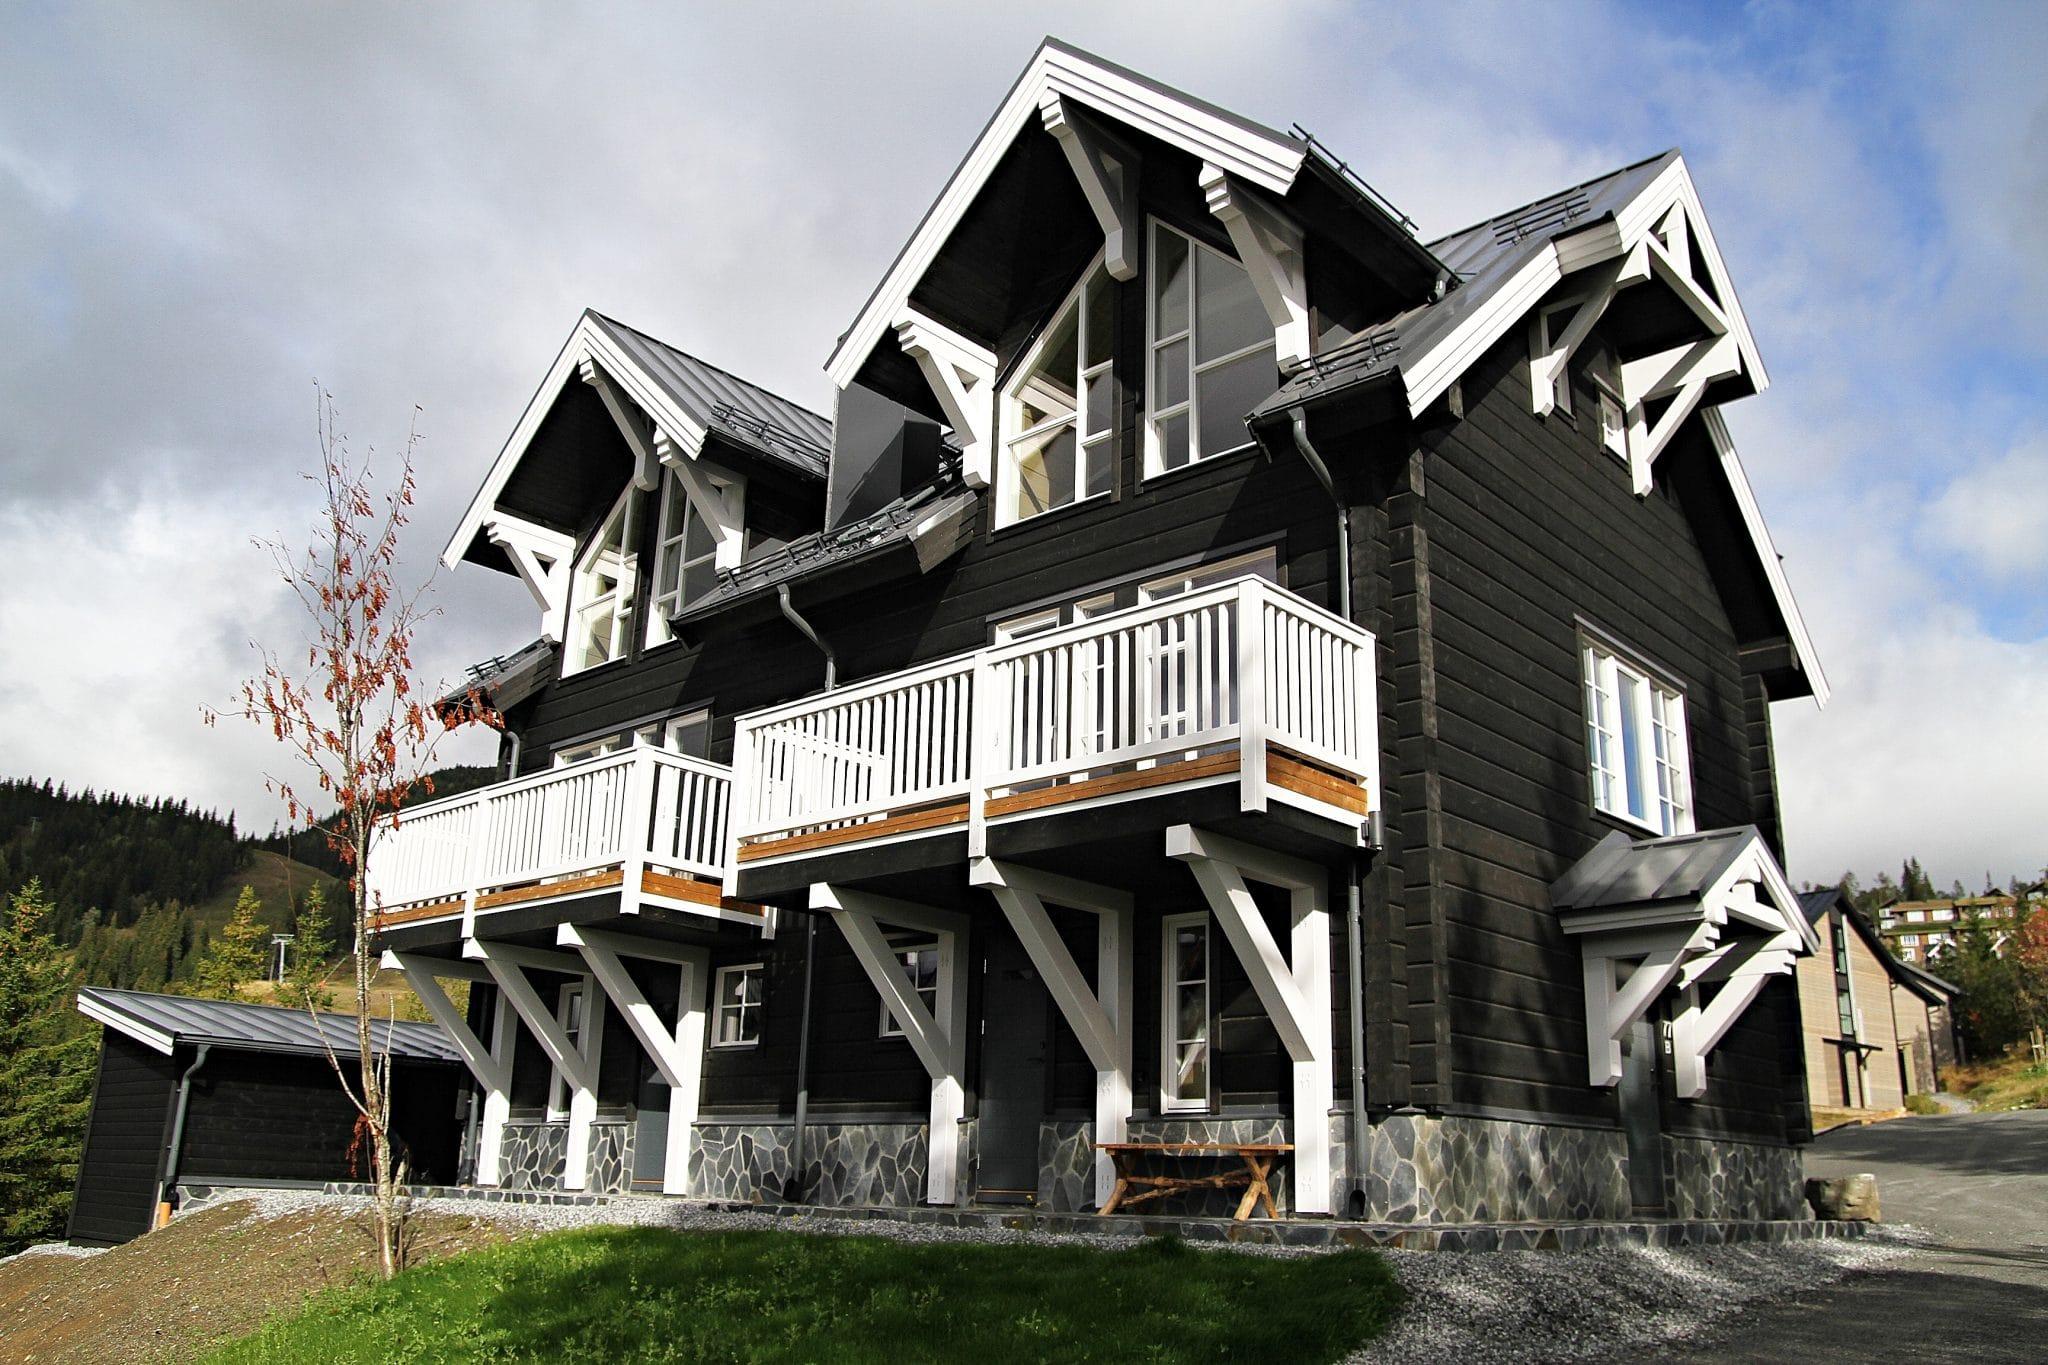 Vackert svart hus med vit balkong i Sadeln